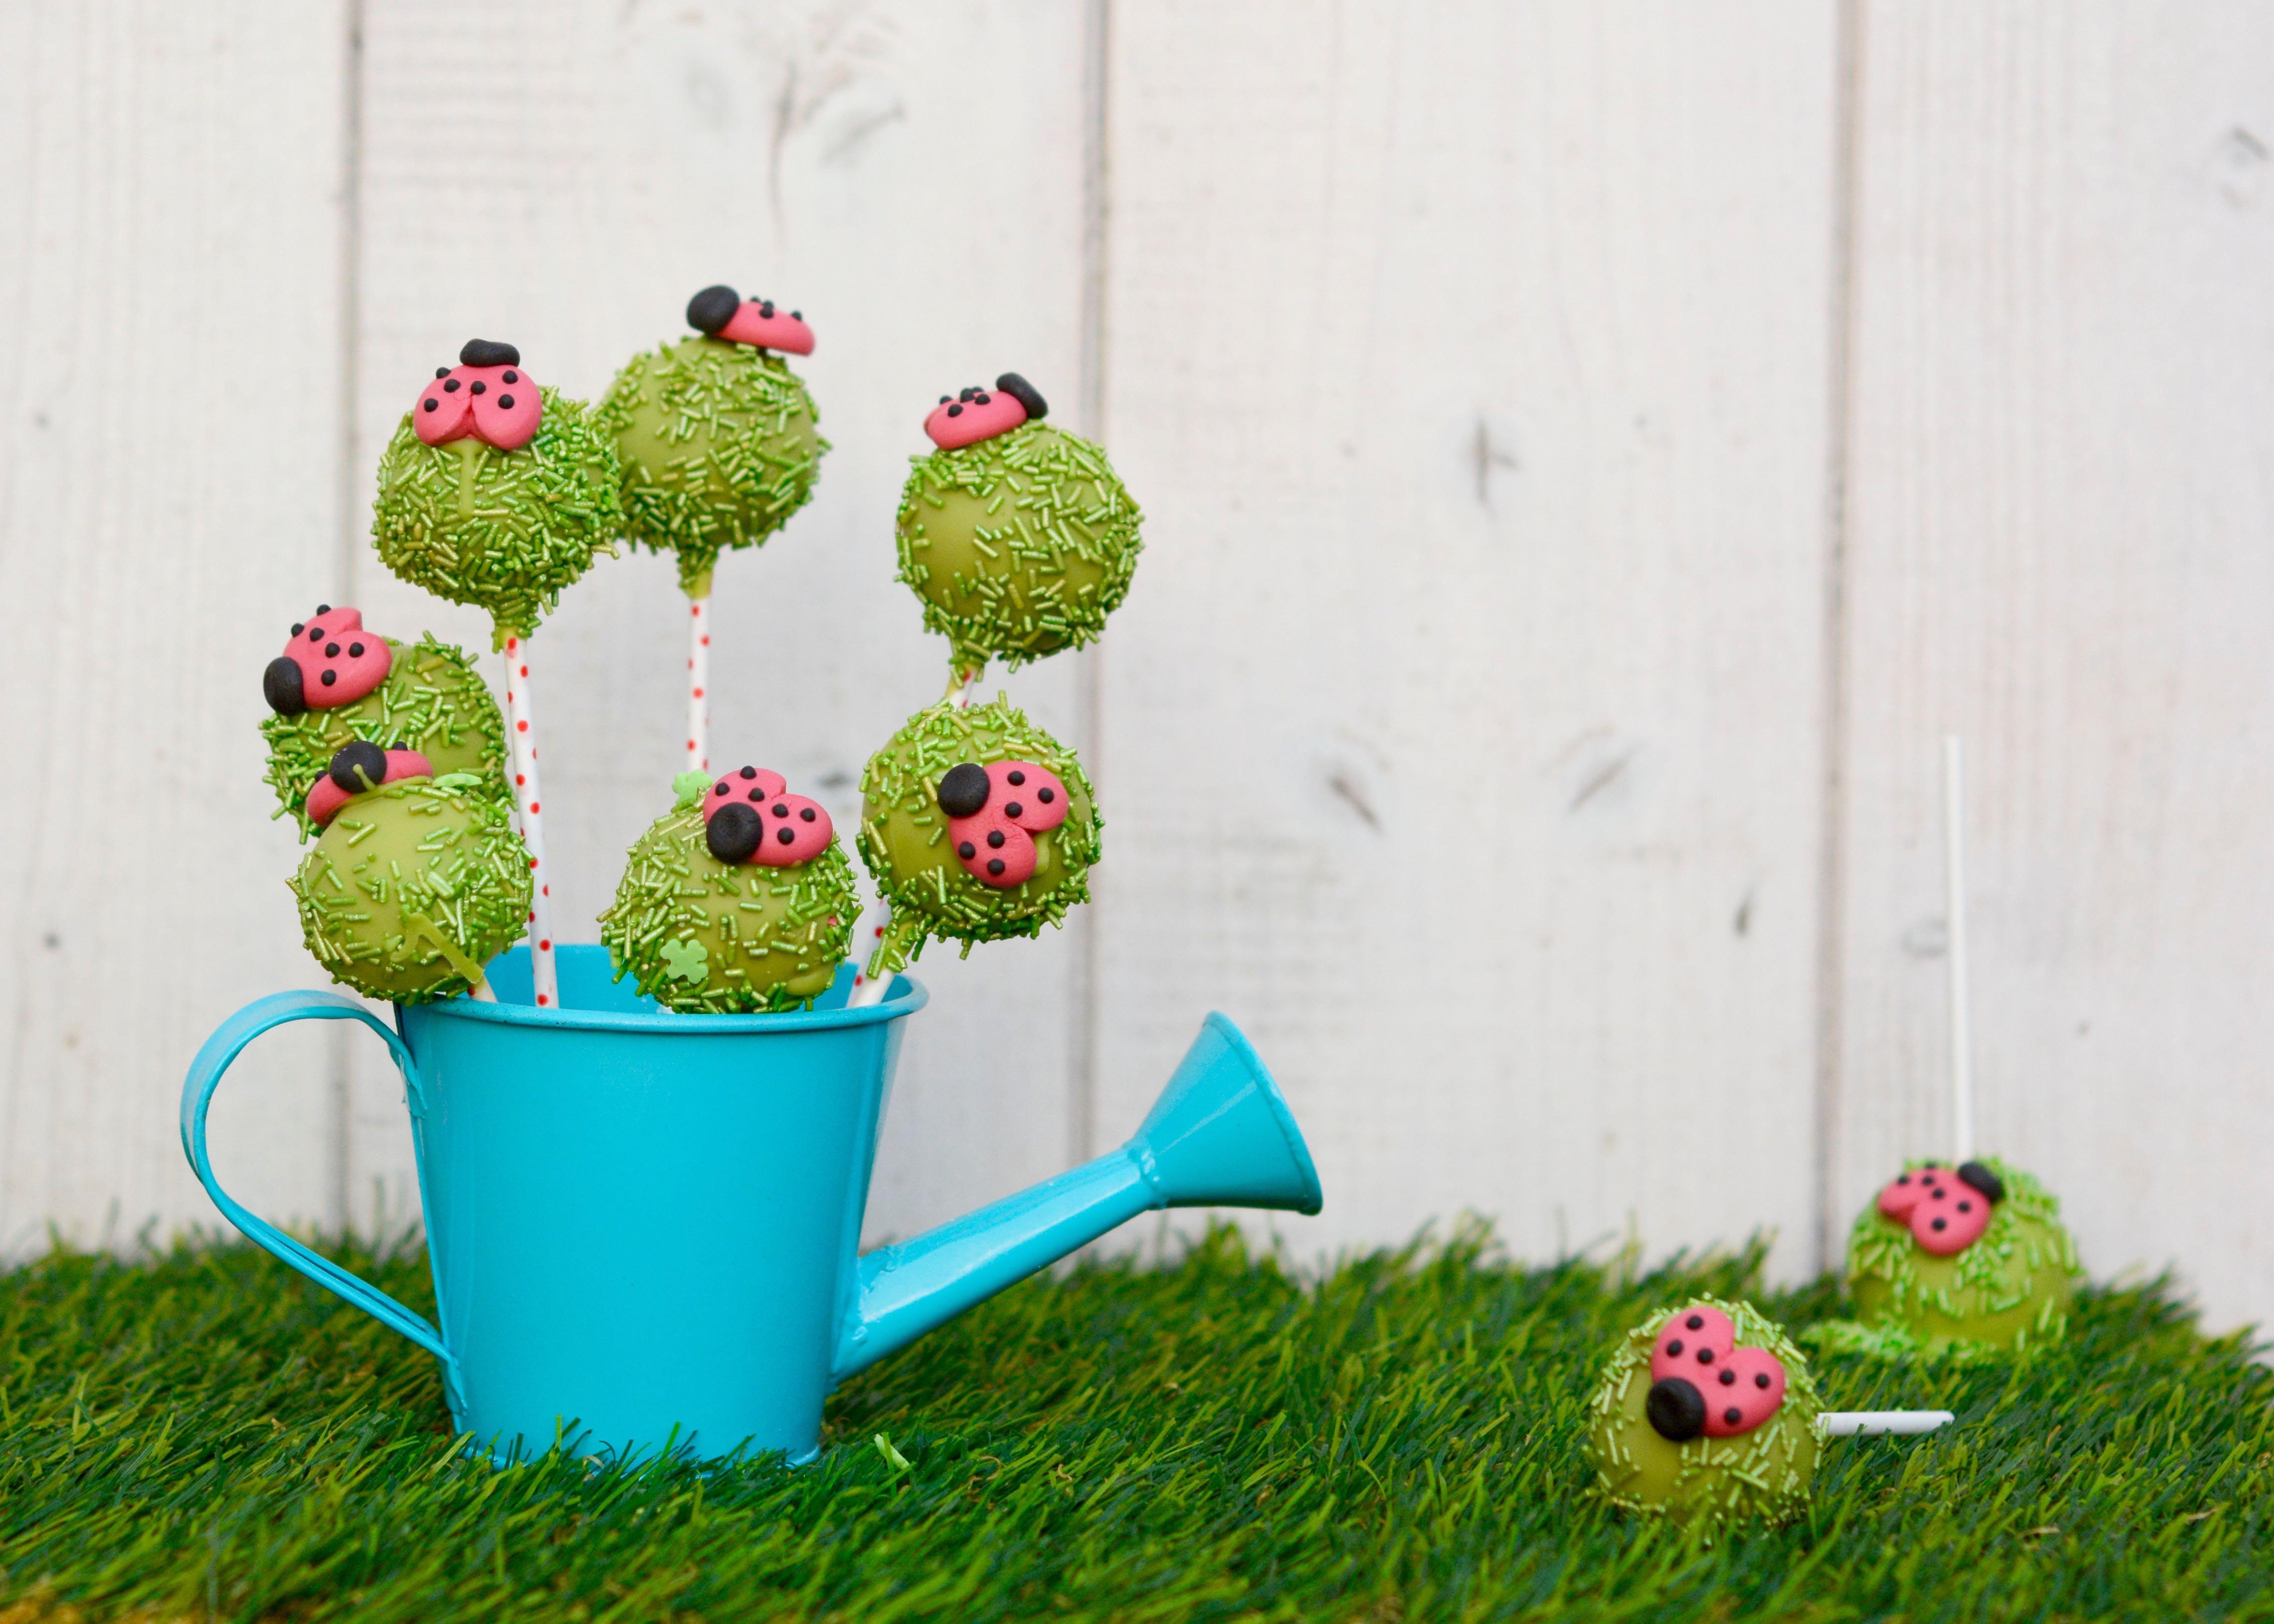 Lustige Wiesen-Marienkäfer-Cakepops